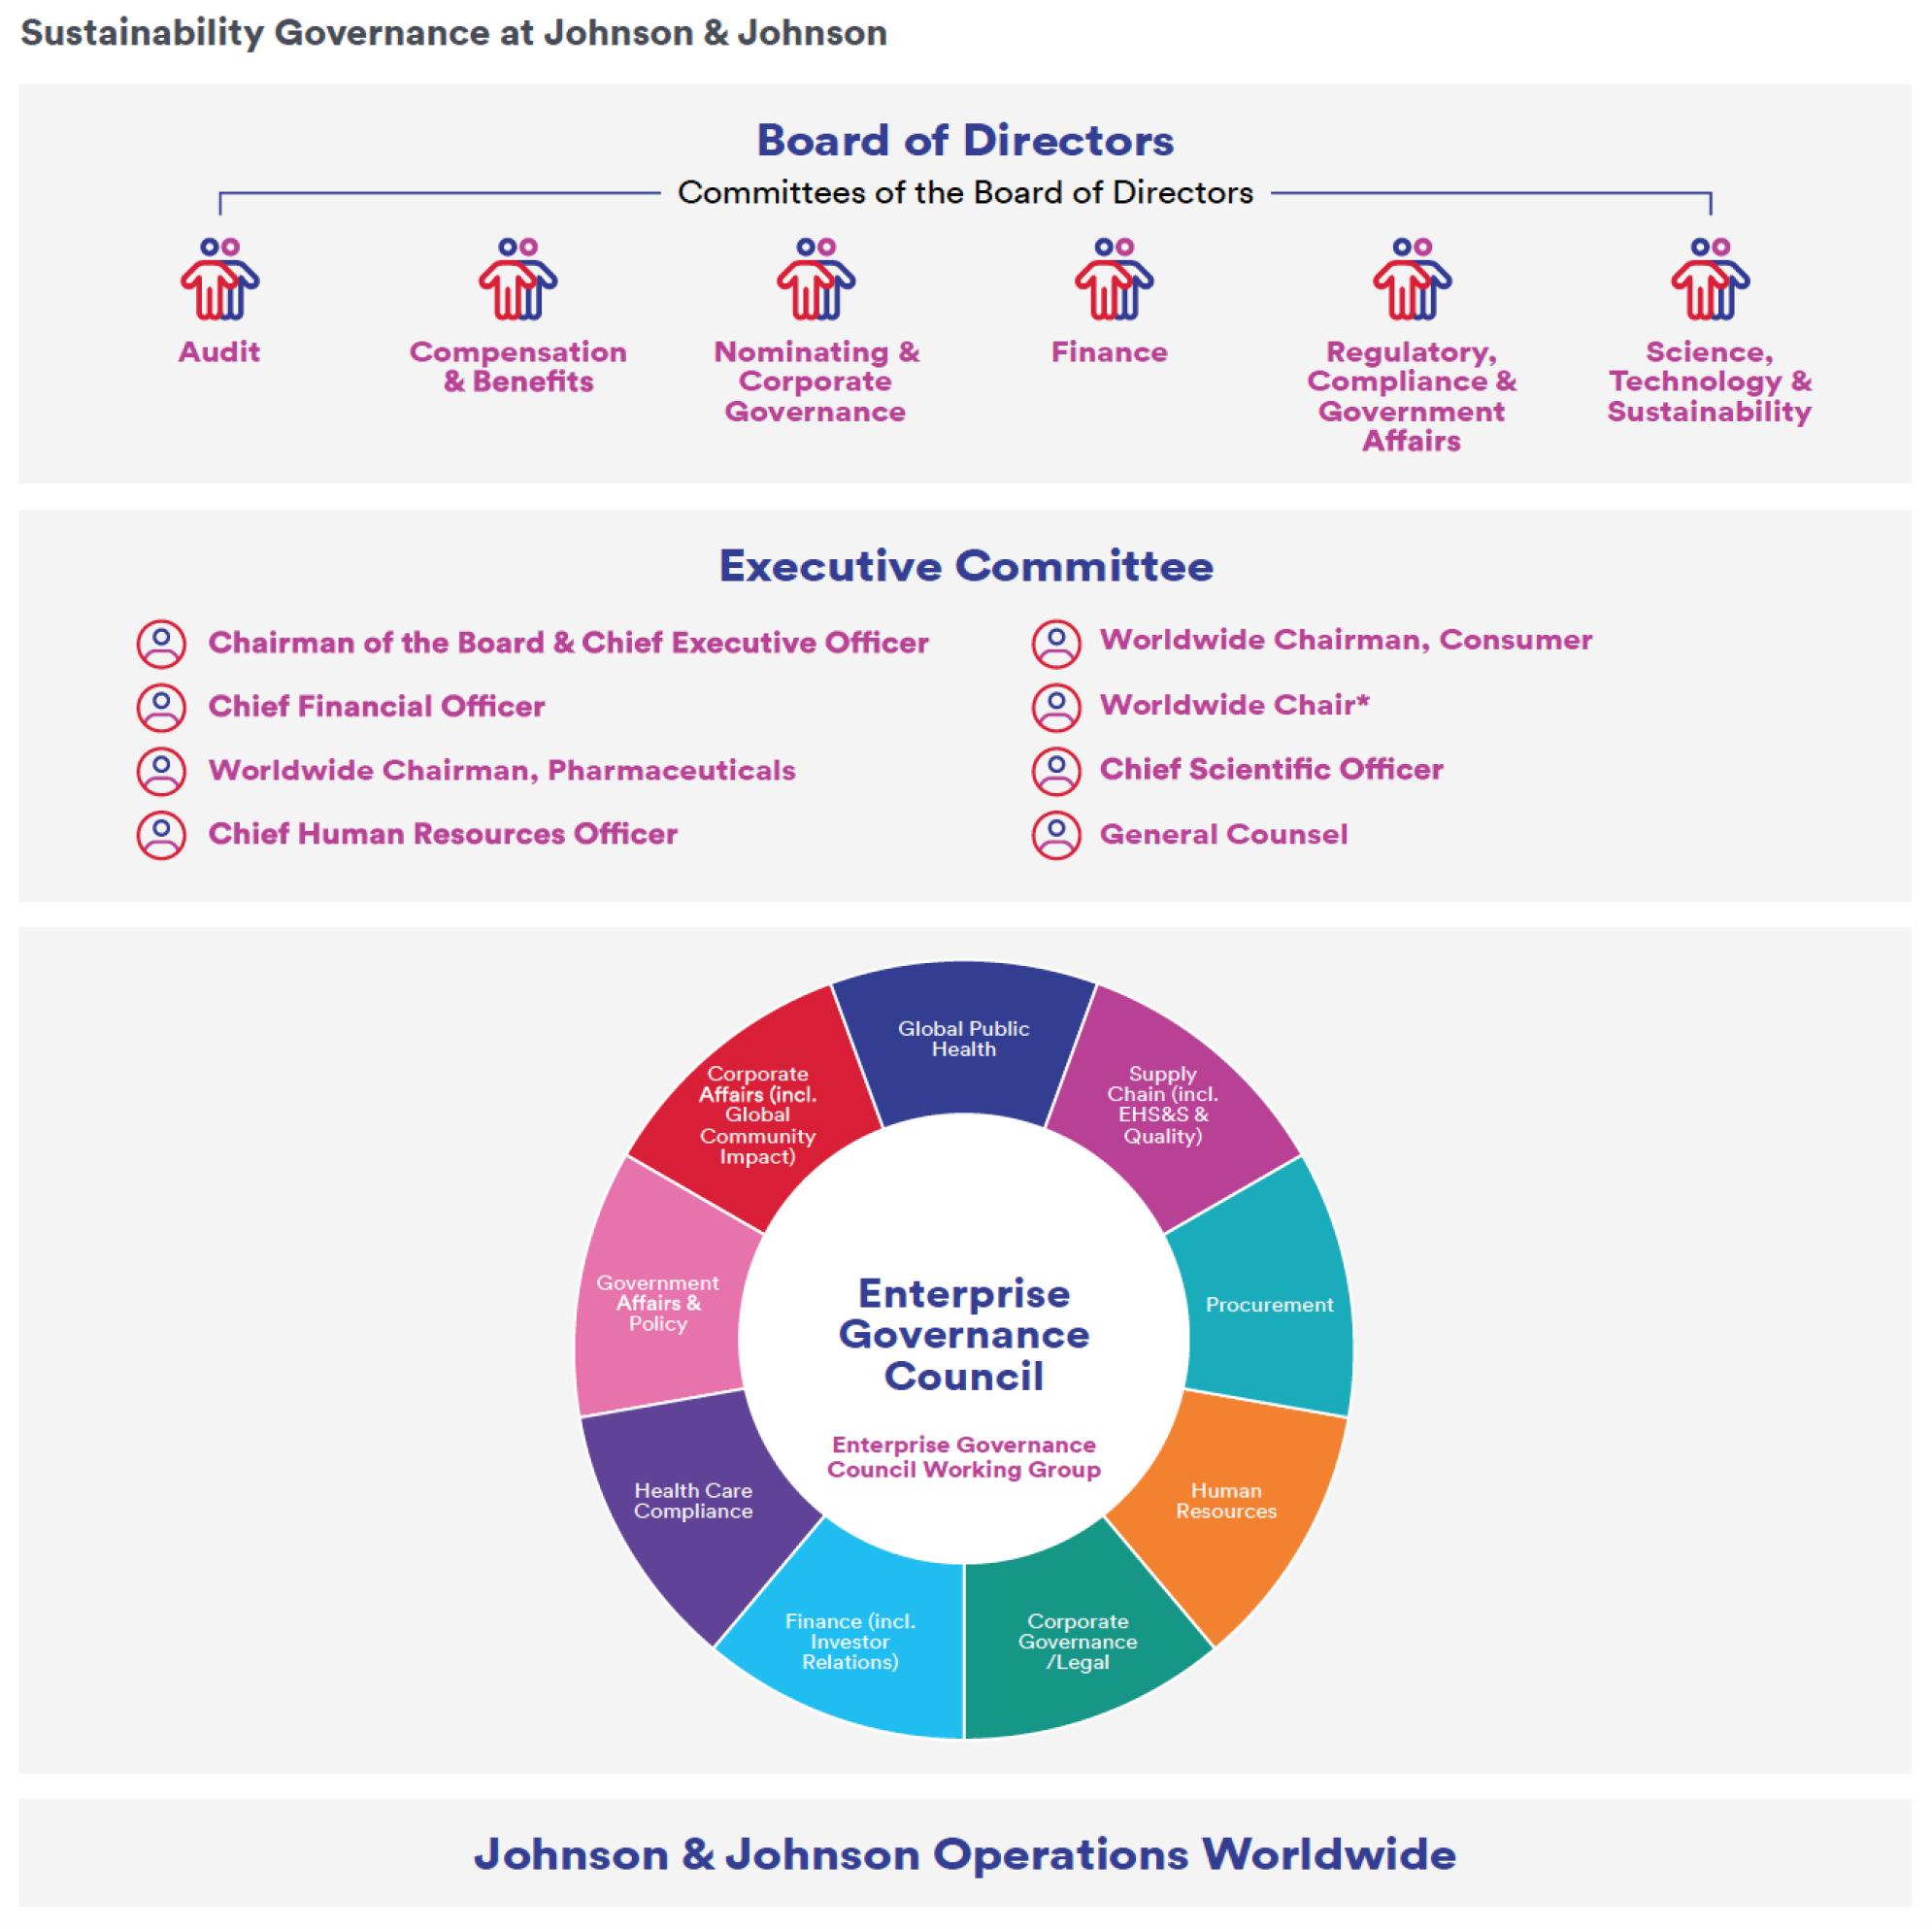 Sustainability Governance at Johnson & Johnson